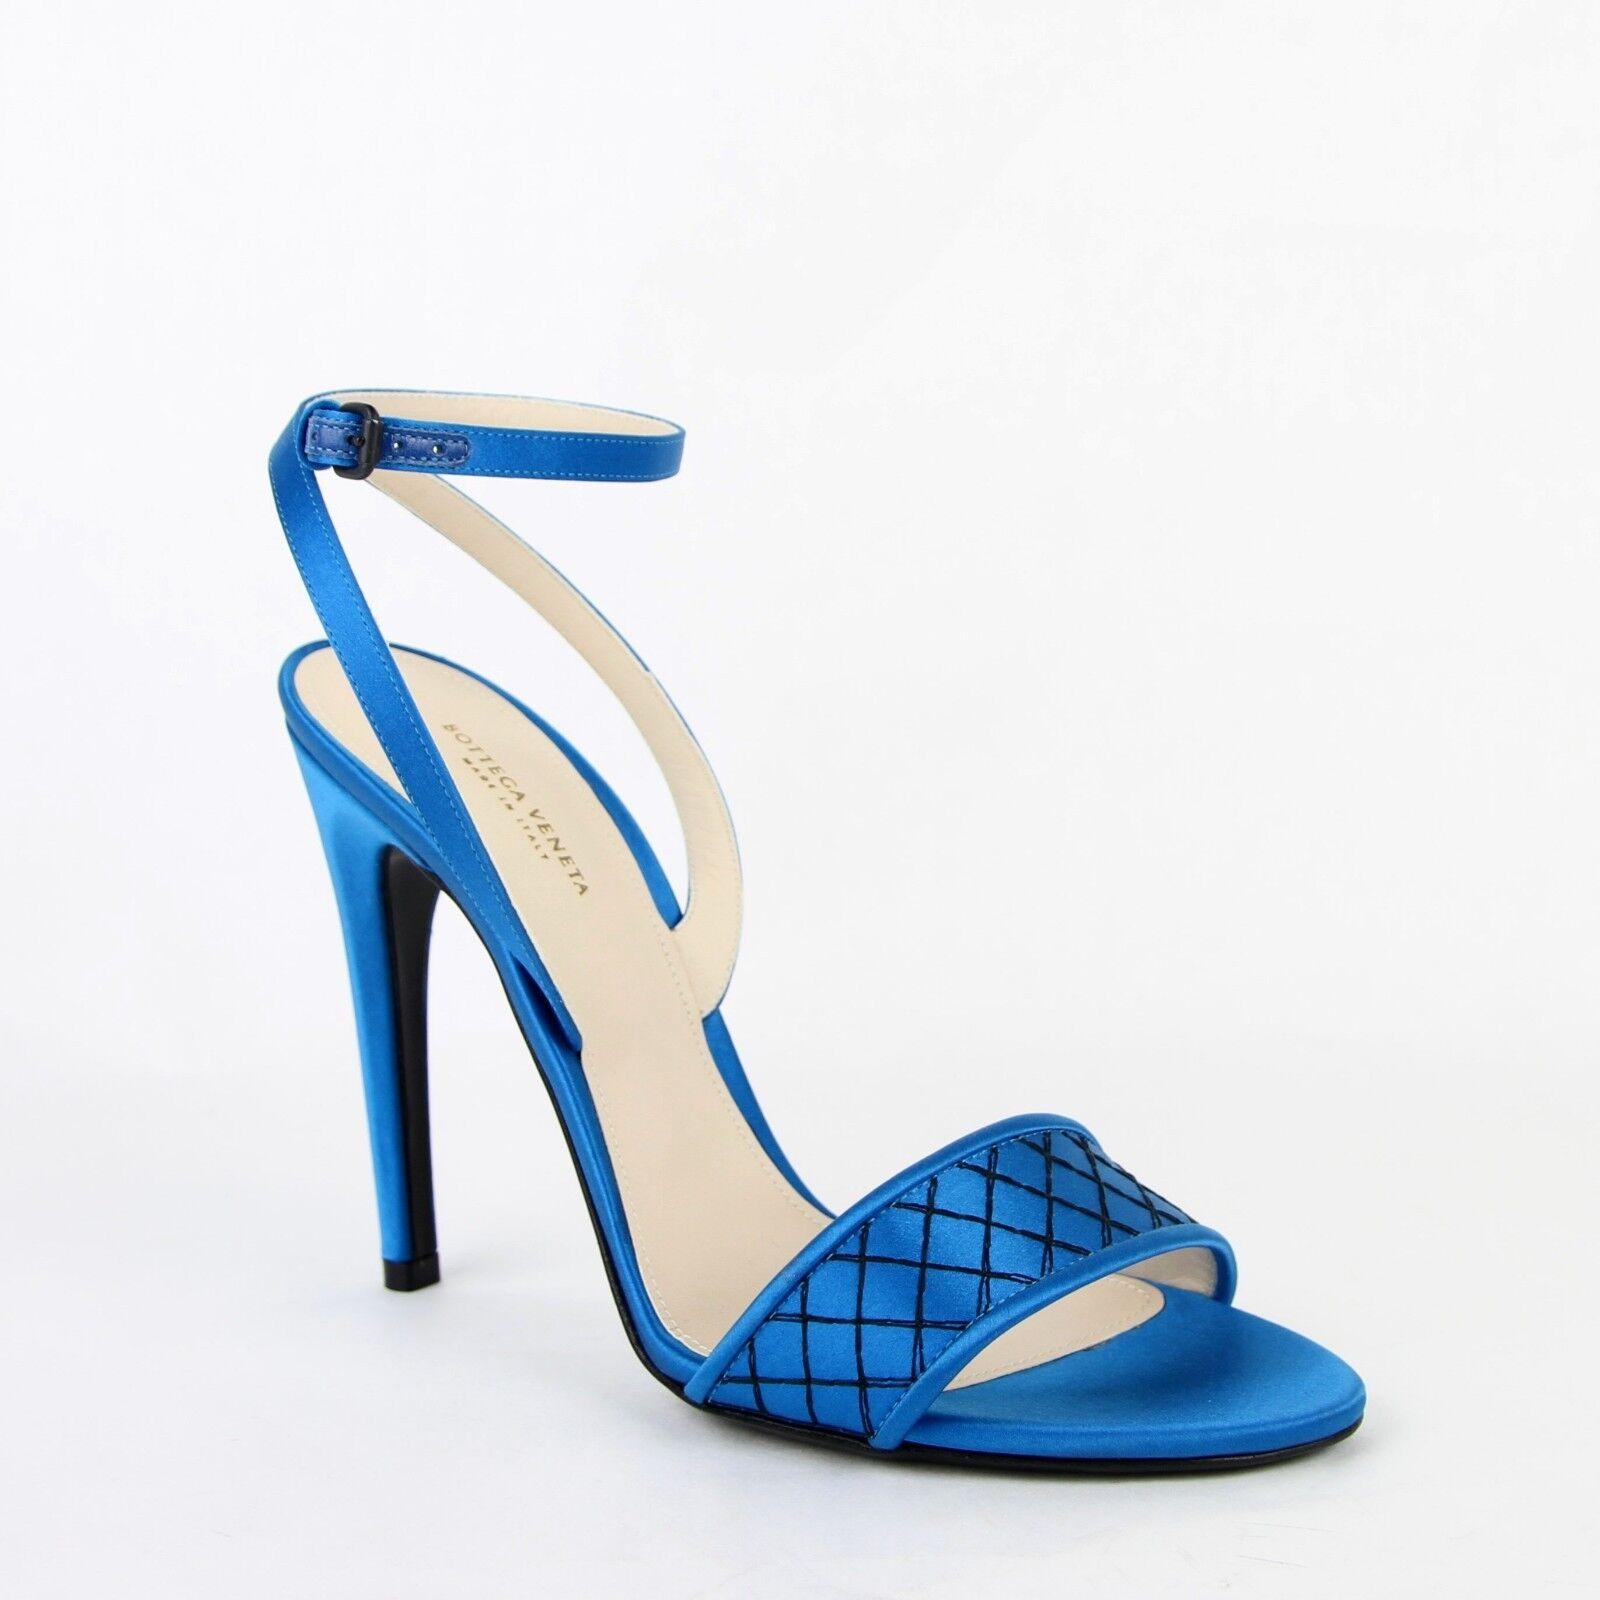 spedizione gratuita  650 New Bottega Veneta donna Teal Teal Teal Satin Ankle Strap Heels 40 US 10 428970 4321  compra meglio